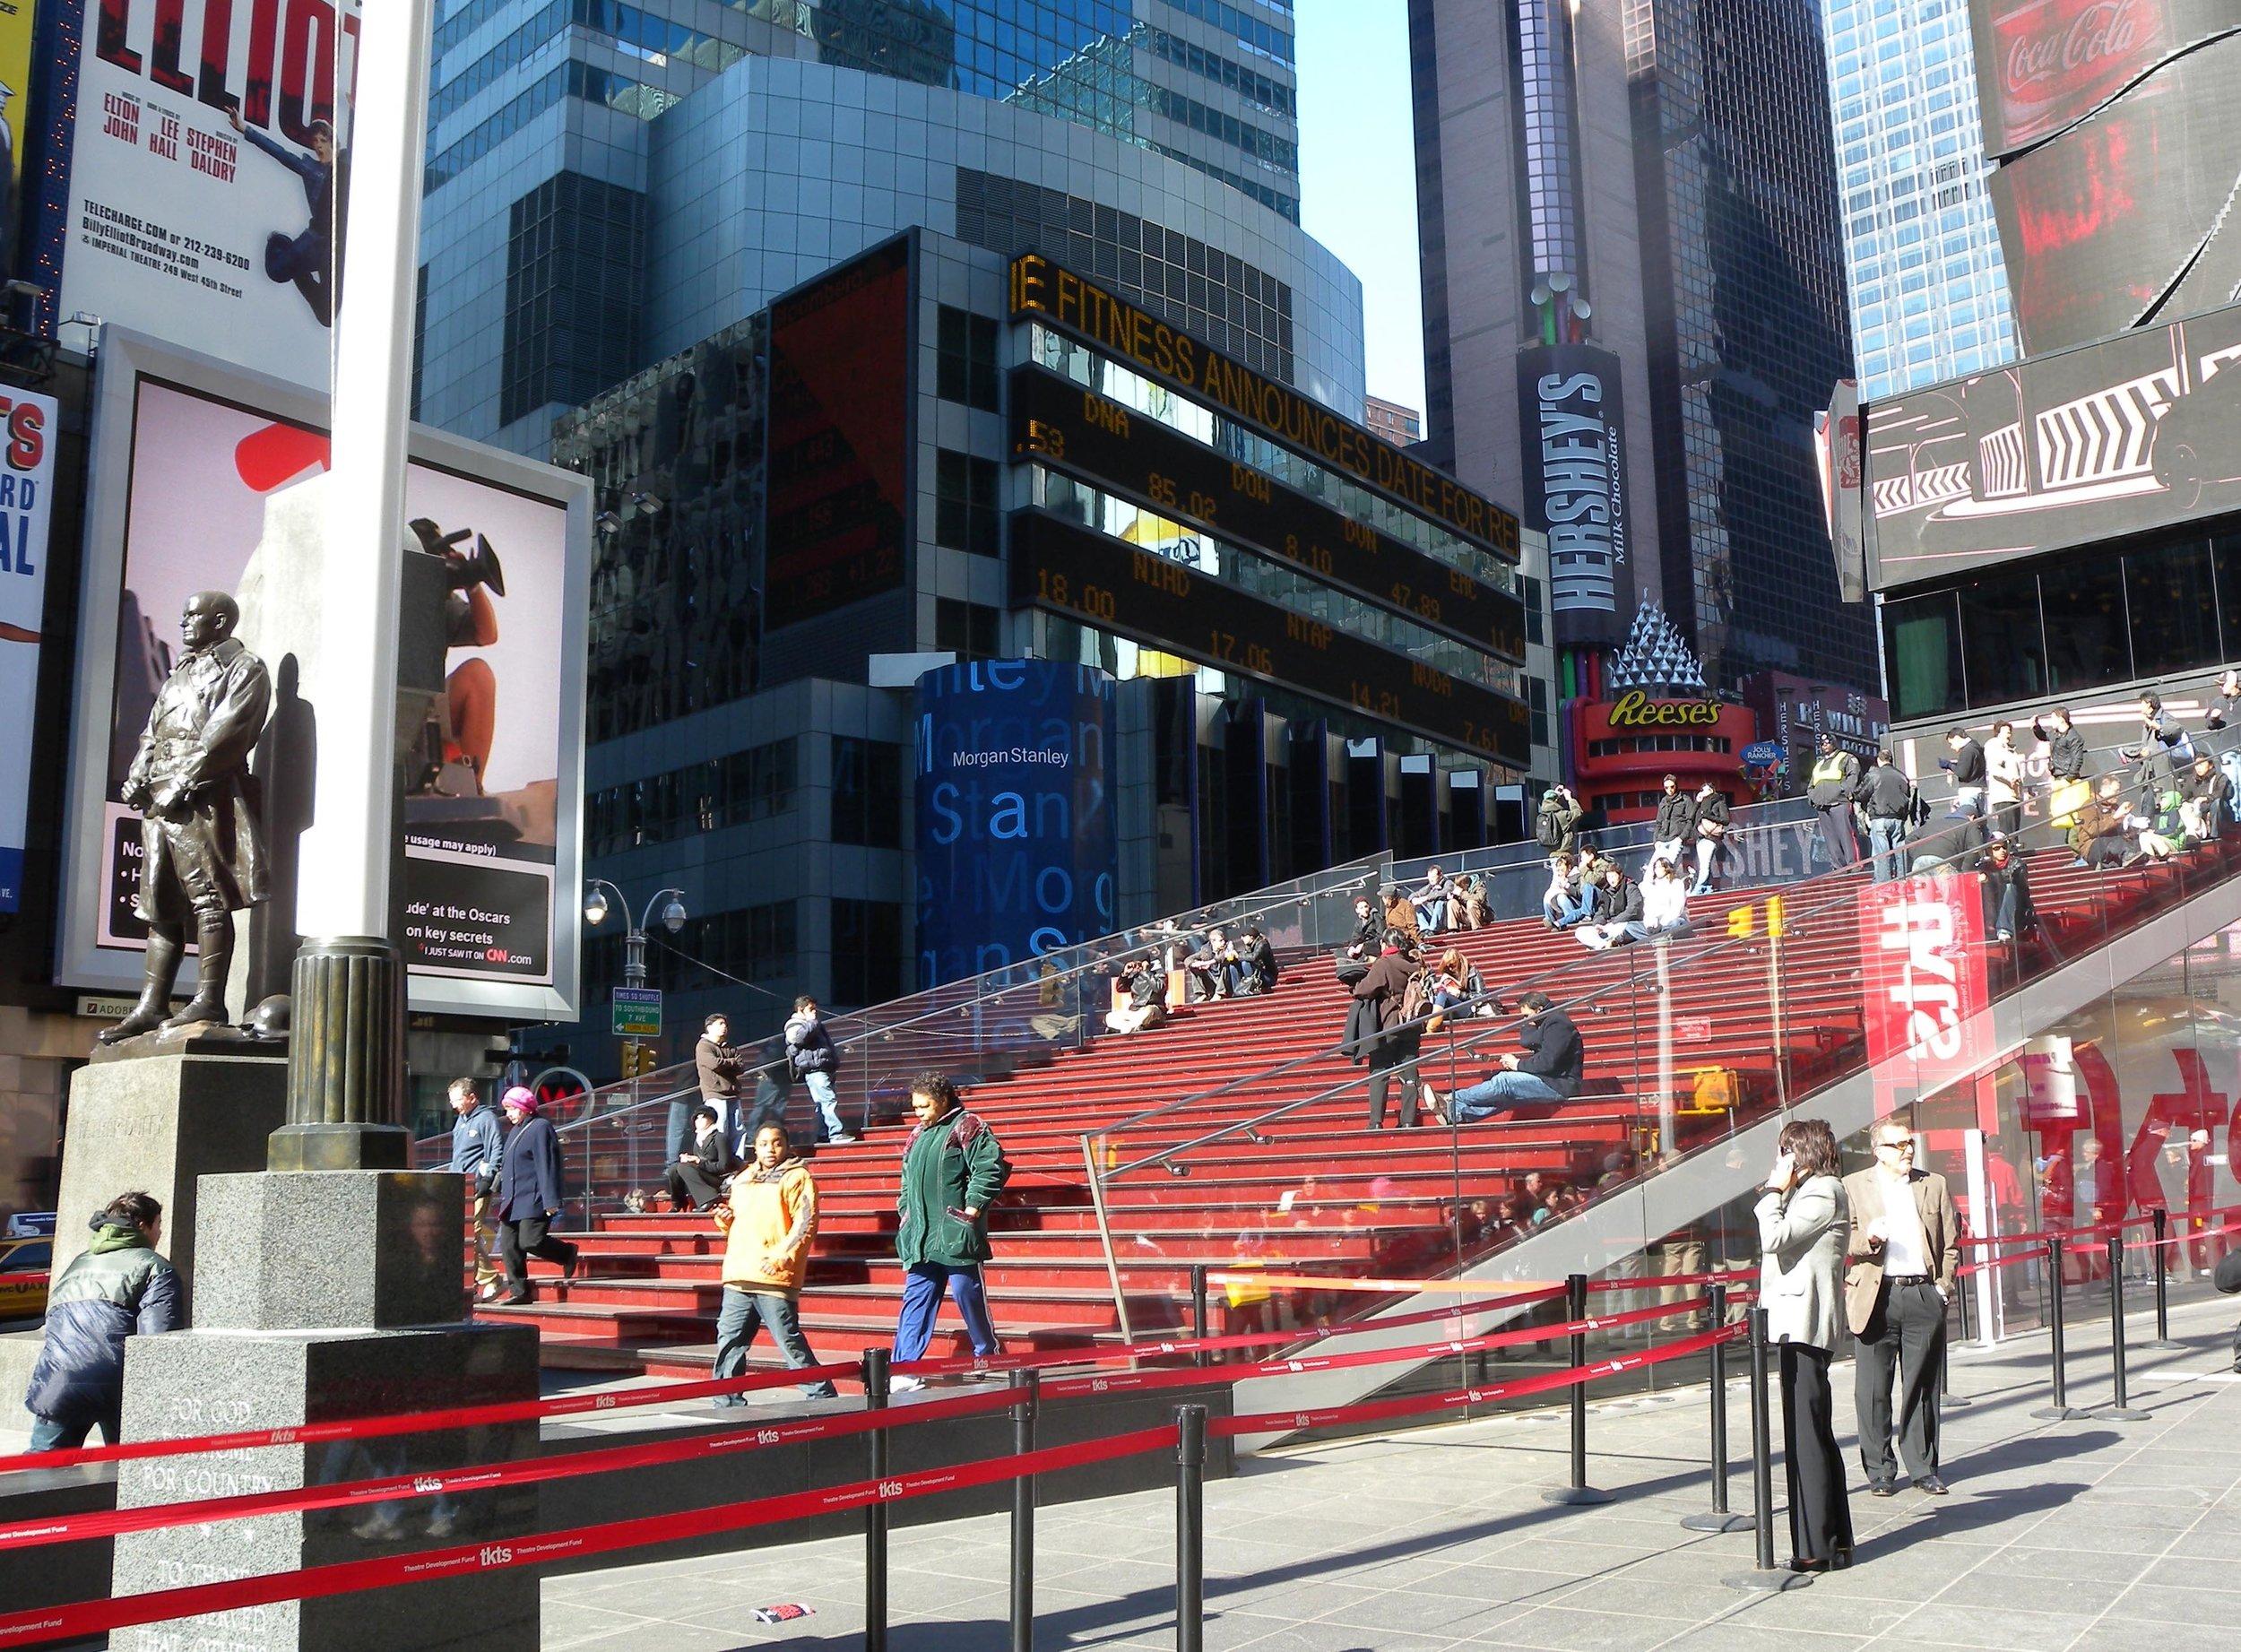 The famous TKTS bleacher steps. Image courtesy of   Jim.henderson/Wikimedia Commons